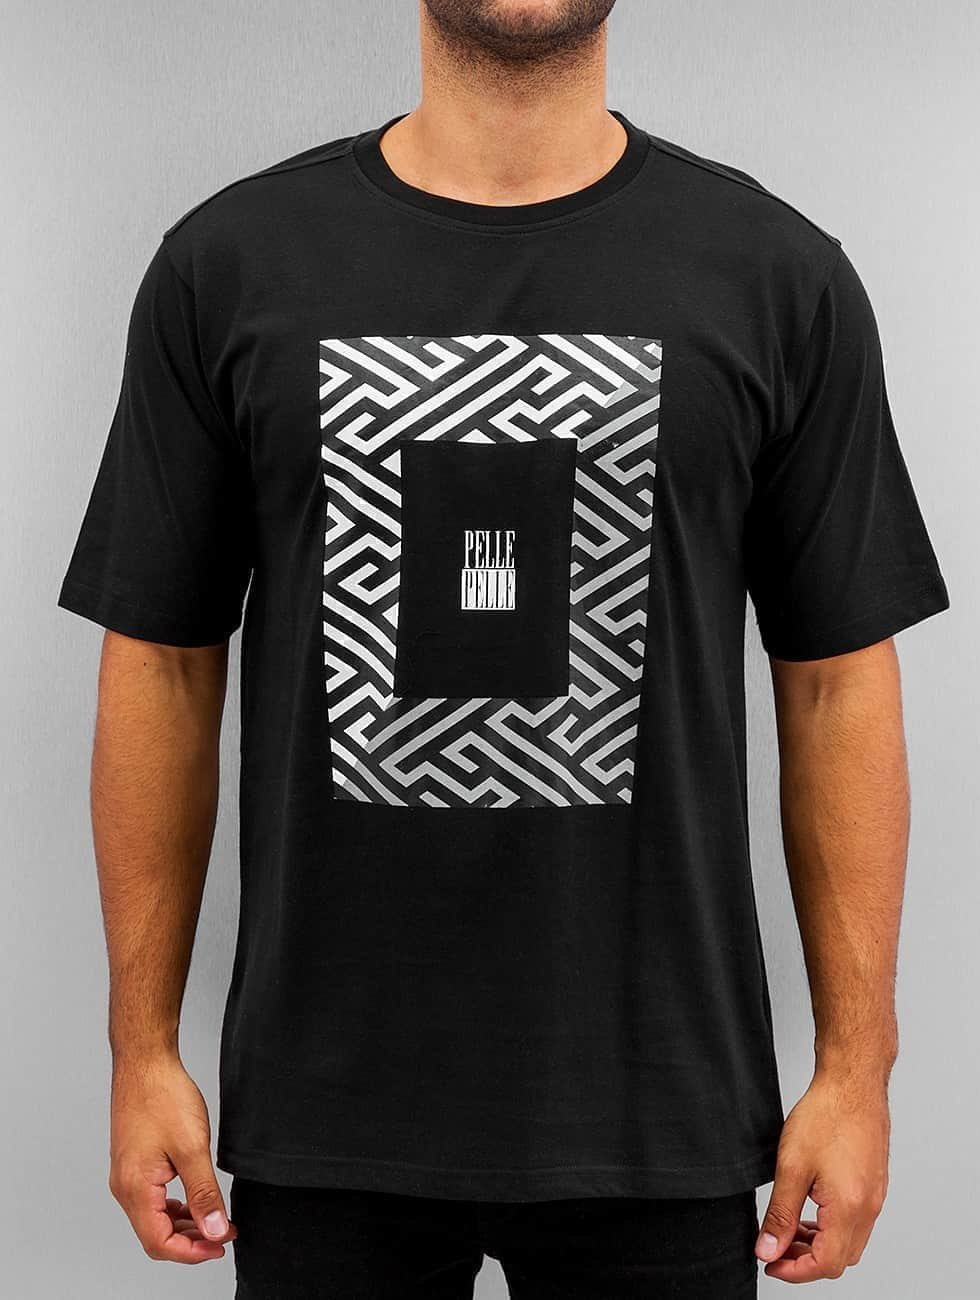 Pelle Pelle T-paidat Dark Maze musta